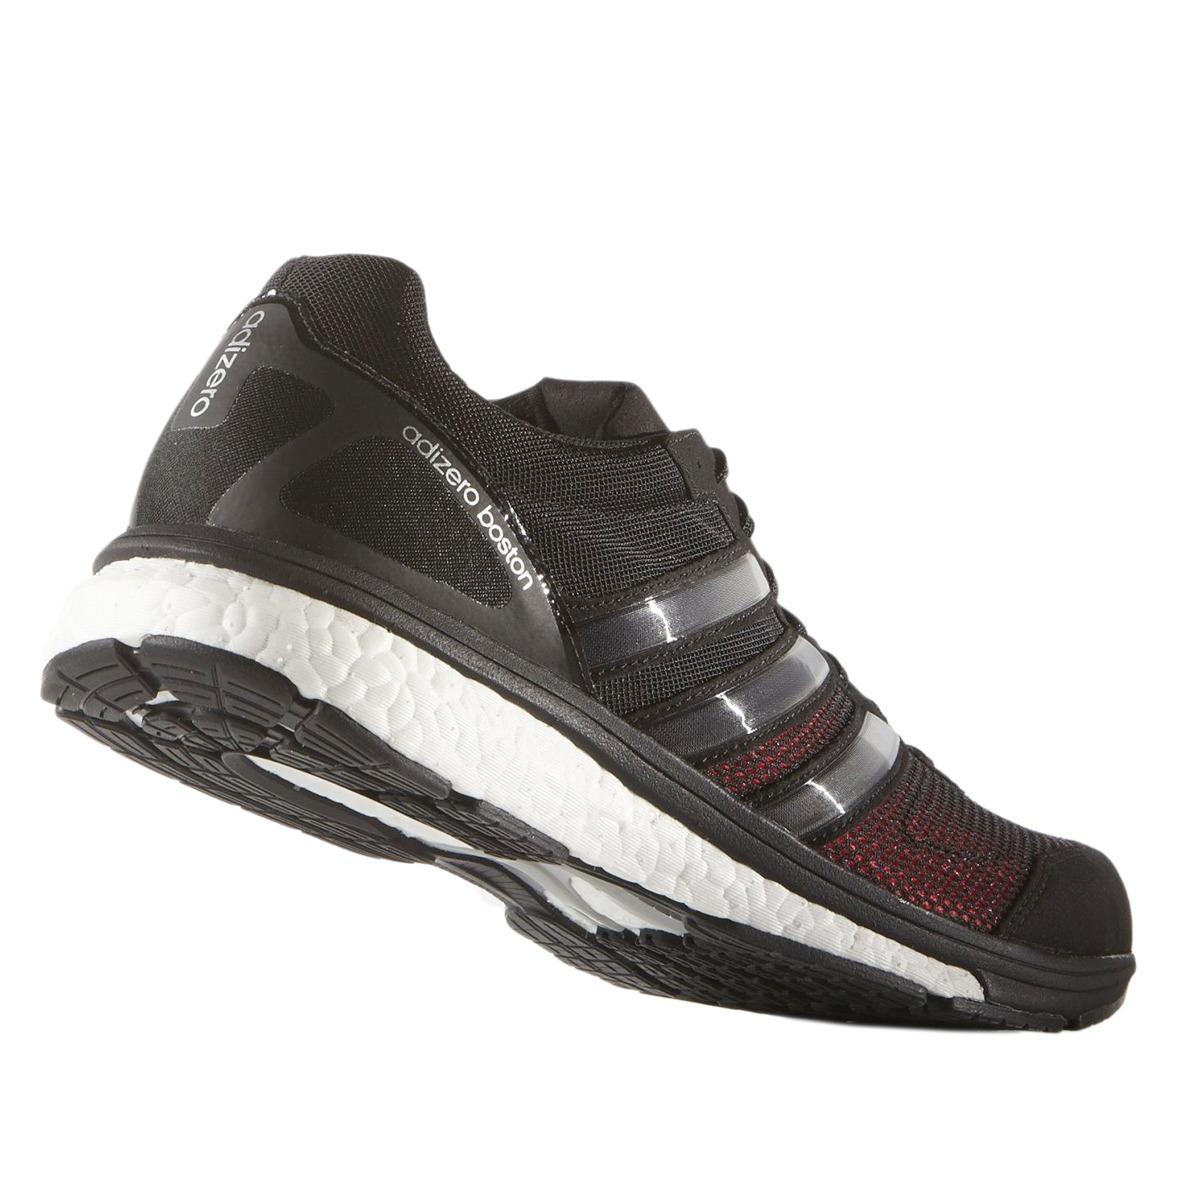 quality design 8742a 2b278 zapatillas adidas adizero boston 5 m. Cargando zoom.